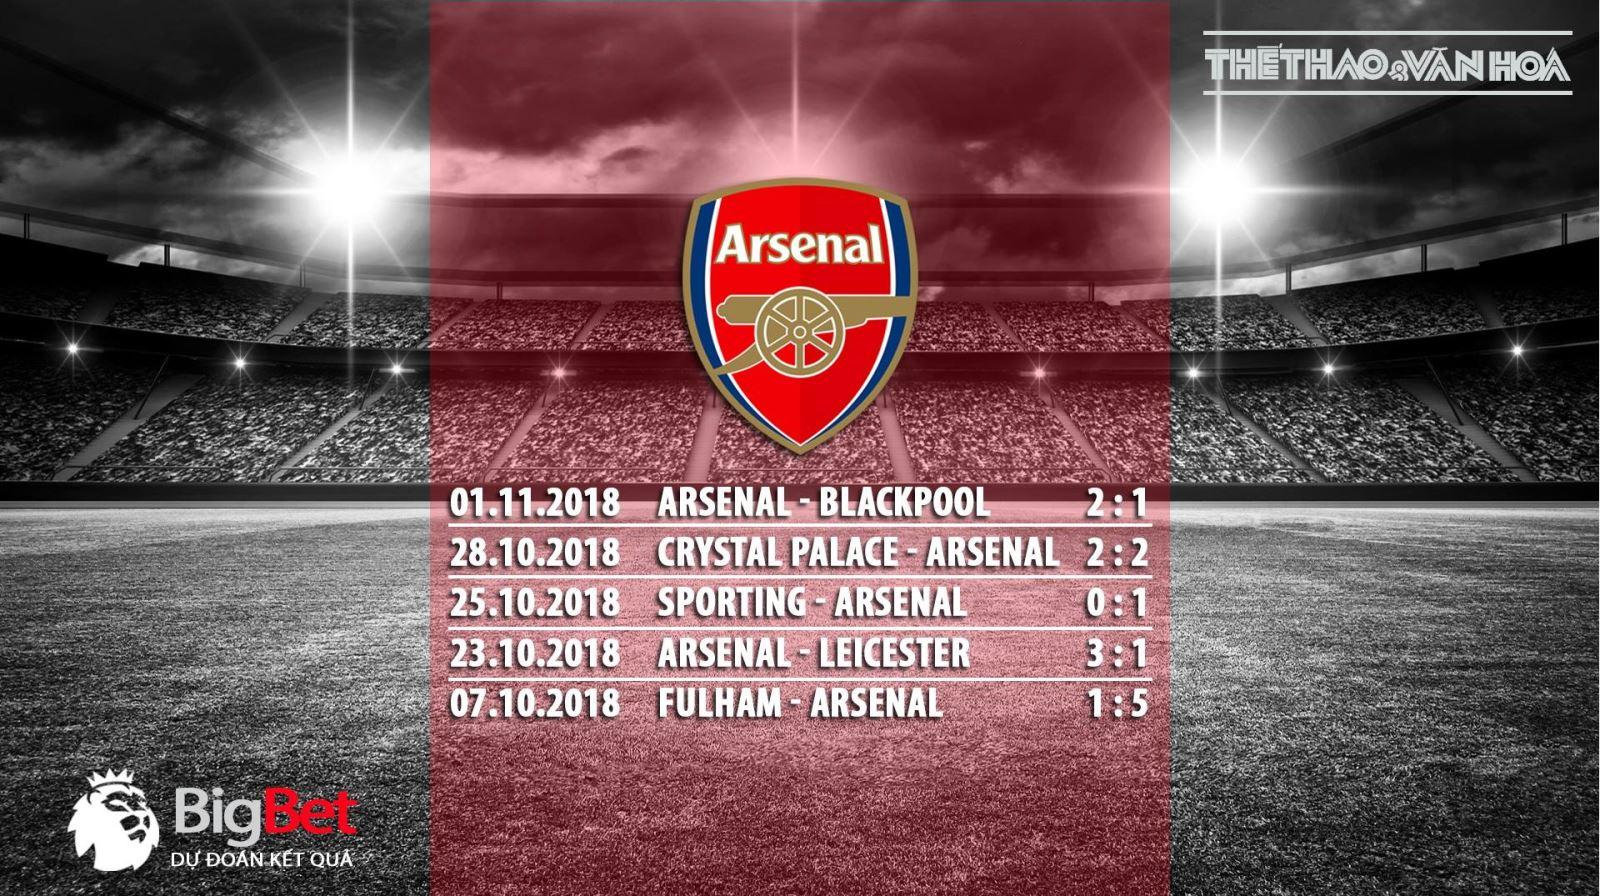 Trực tiếp Arsenal vs Liverpool, trực tiếp Liverpool vs Arsenal, xem trực tiếp Arsenal vs Liverpool, xem trực tiếp Liverpool vs Arsenal, trực tiếp bóng đá, xem truc tiep bong da